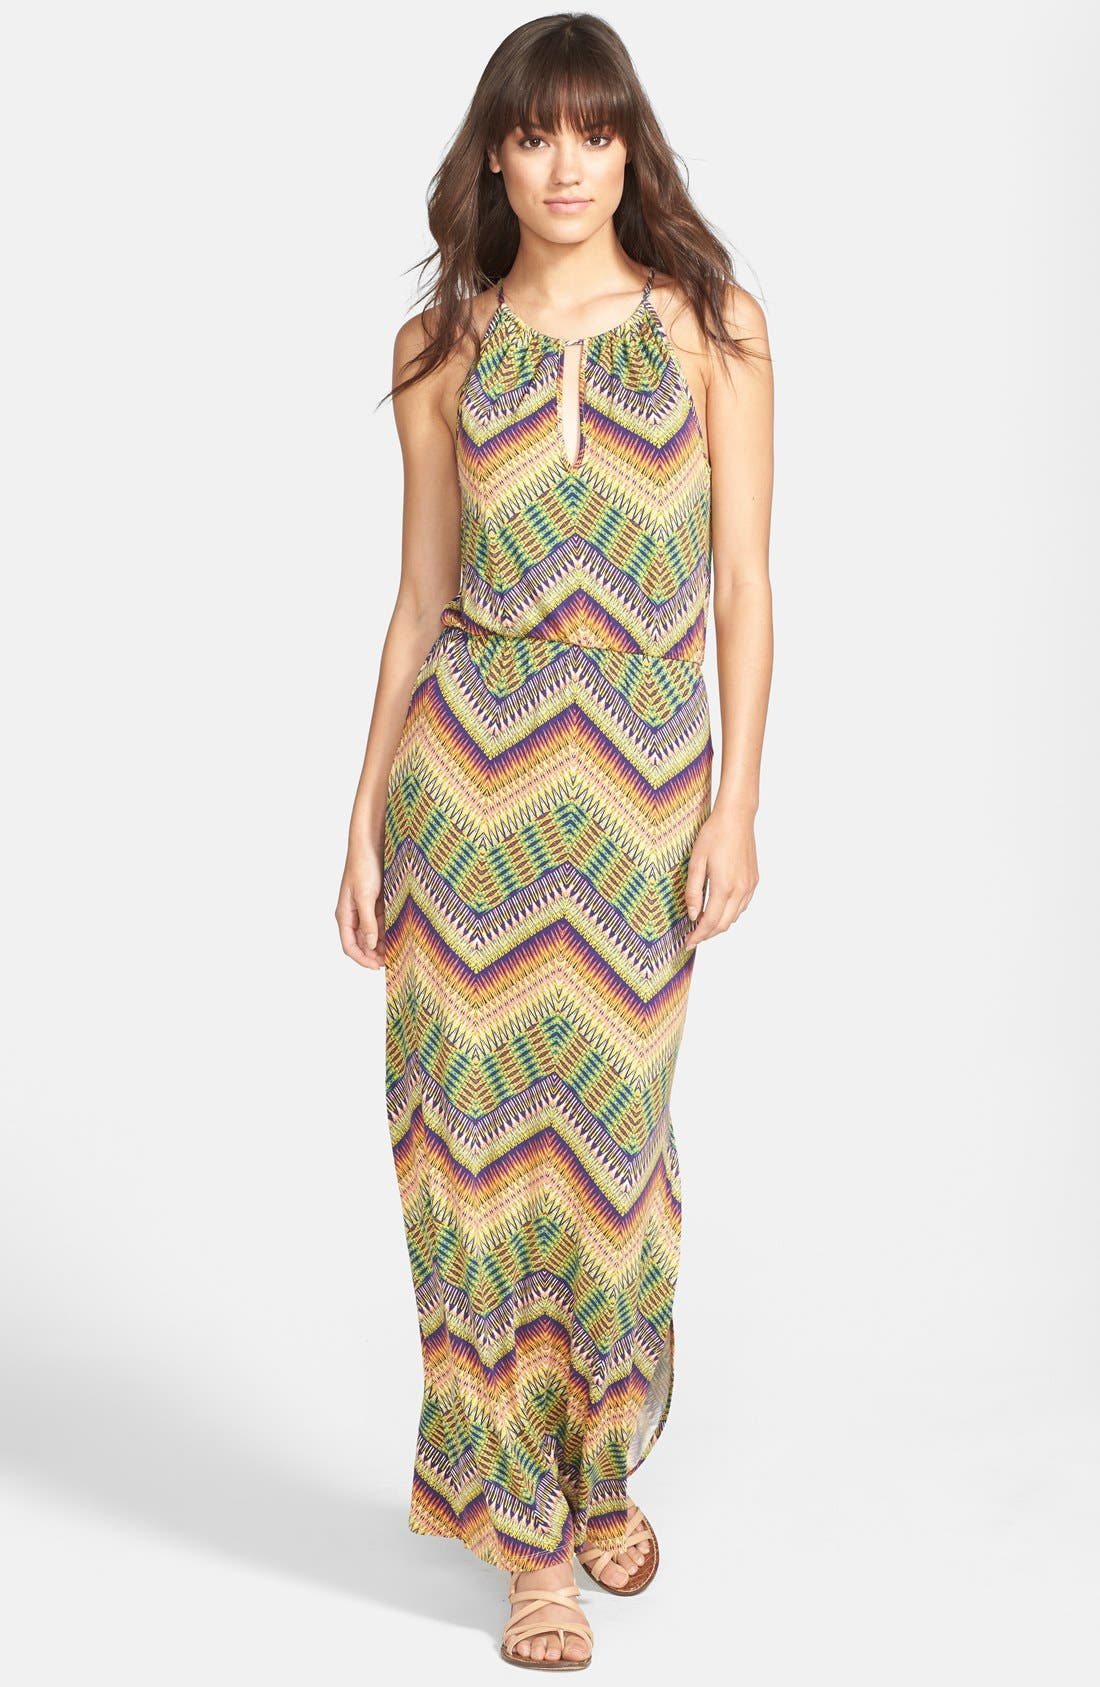 Alternate Image 1 Selected - Sanctuary 'Island' Chevron Print Cutout Maxi Dress